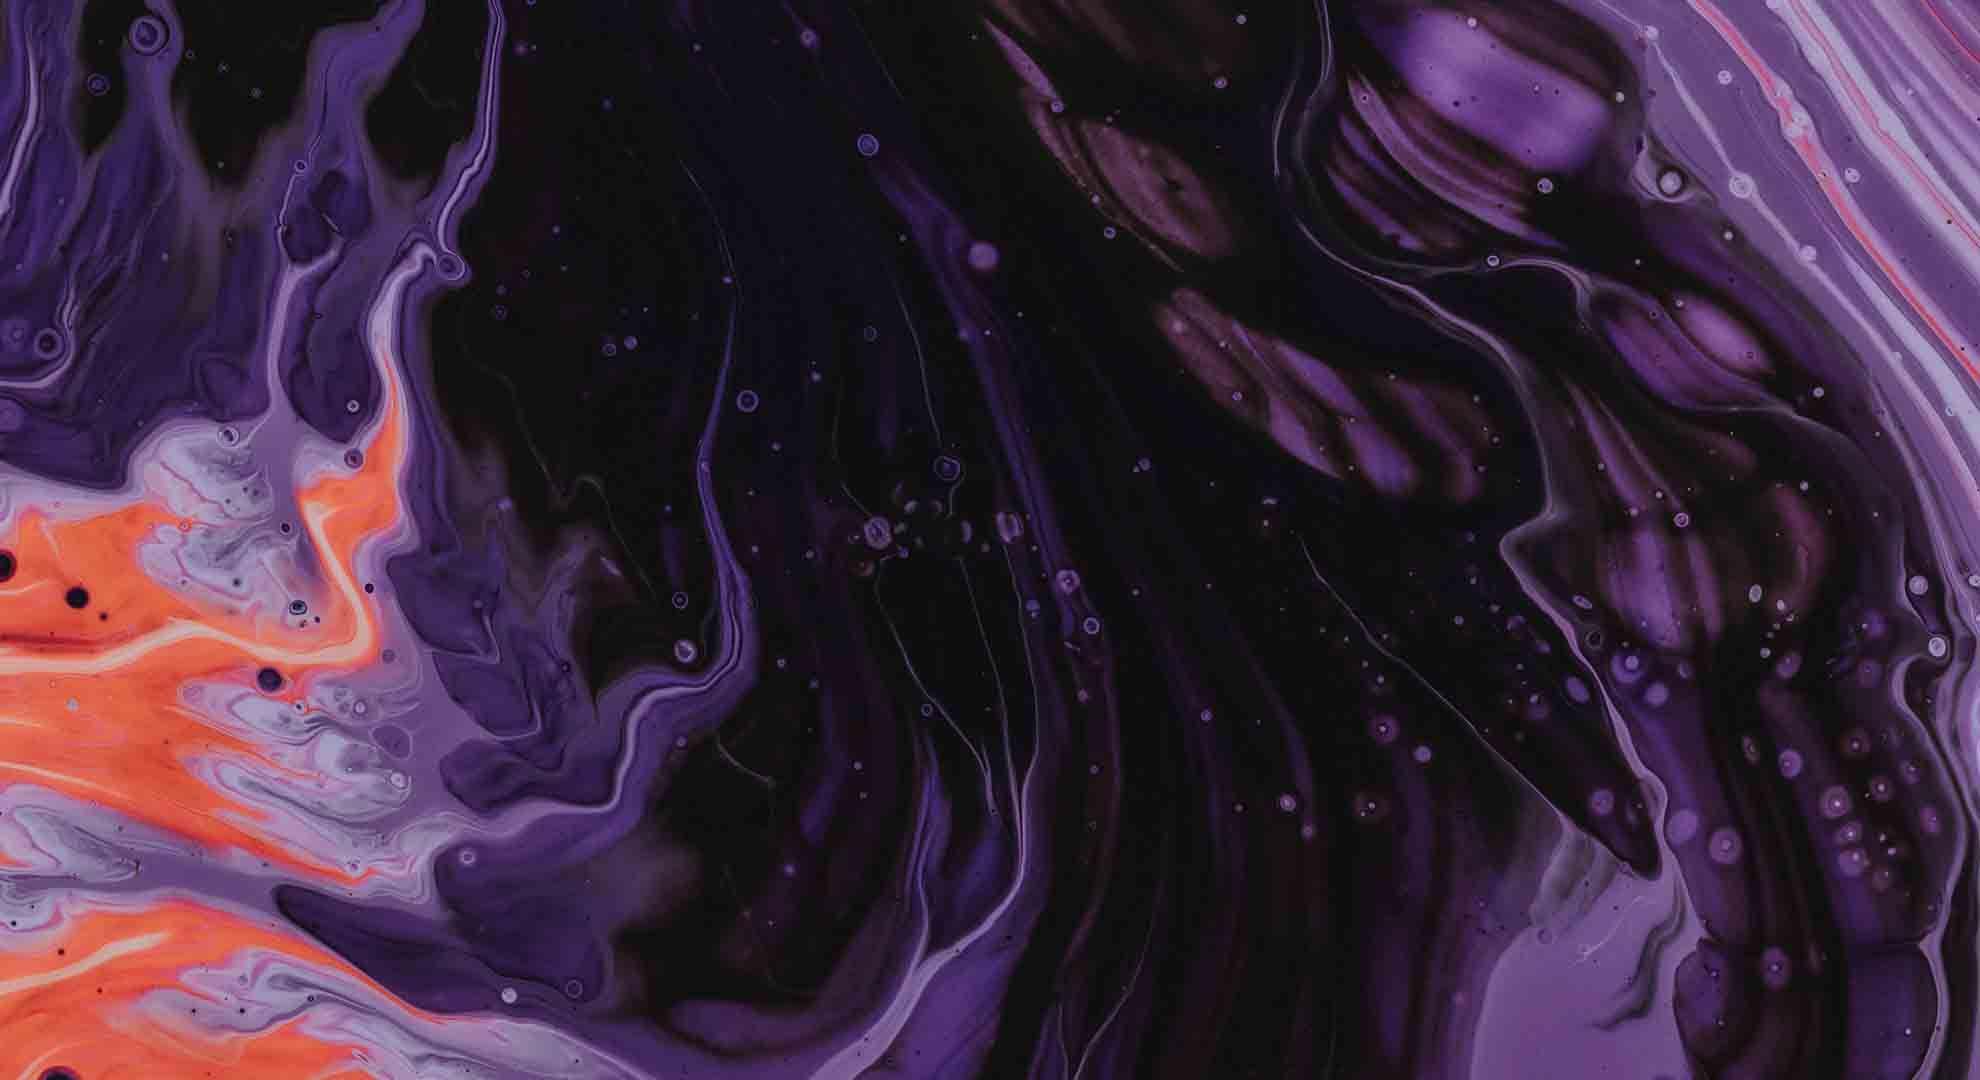 16 Acrylic Texture Ideas for Breathtaking Digital Painting Outlook - Acrylic texture gives high ...